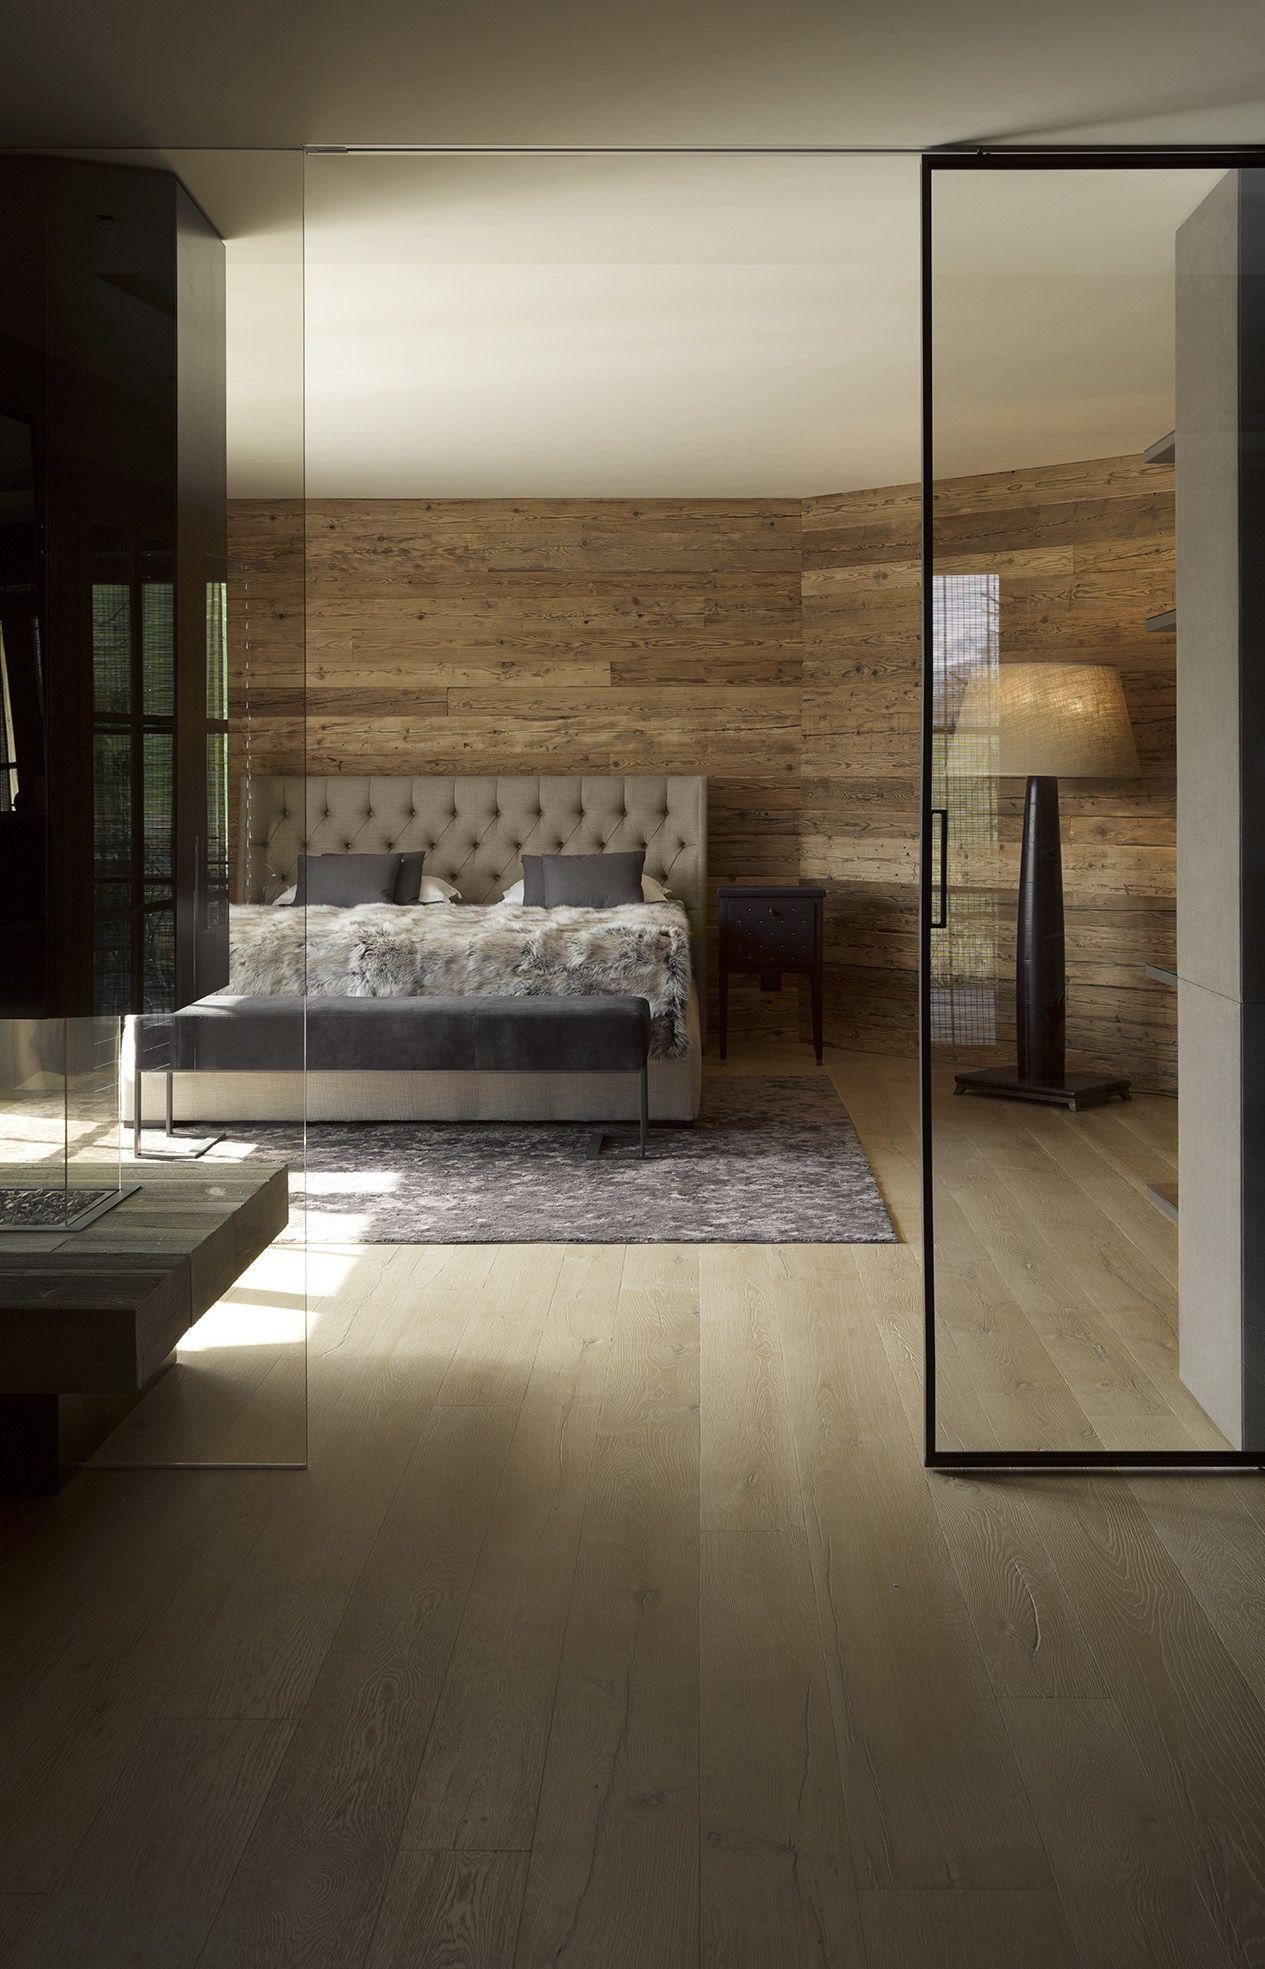 thomas popinger interior interior. Black Bedroom Furniture Sets. Home Design Ideas